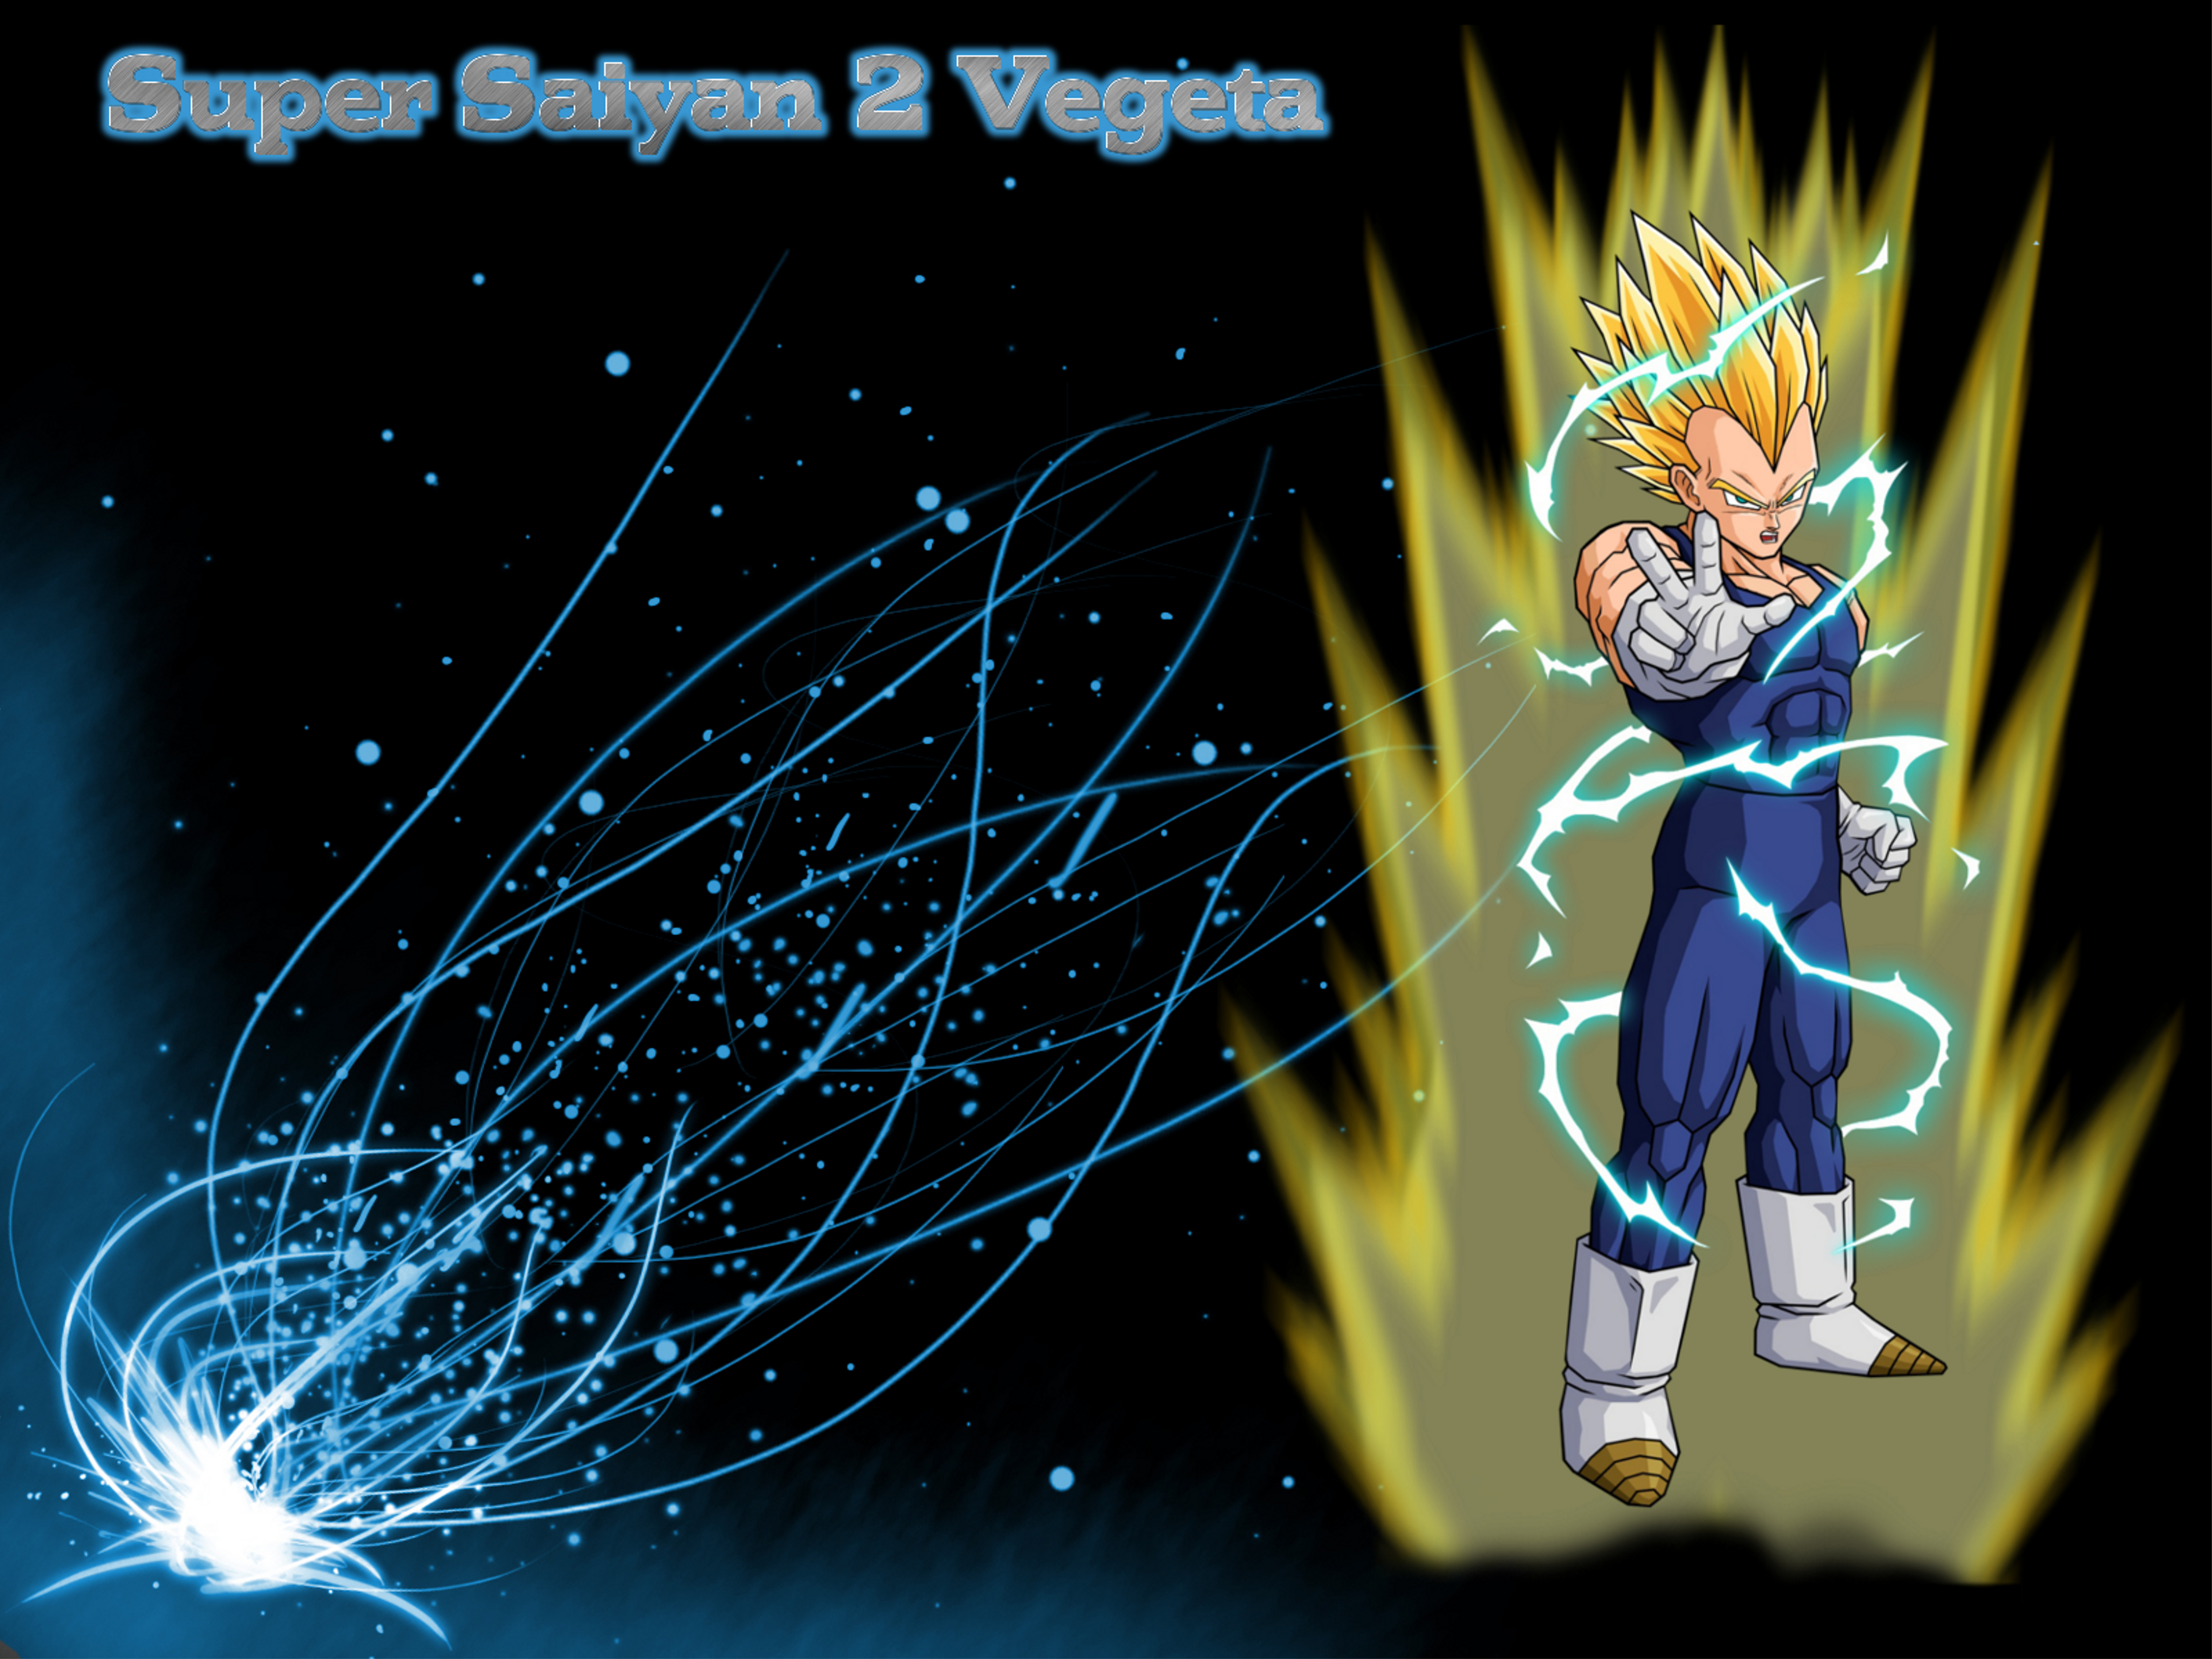 Super Saiyan 2 Vegeta Wallpaper 1 by bigtam211 5000x3750